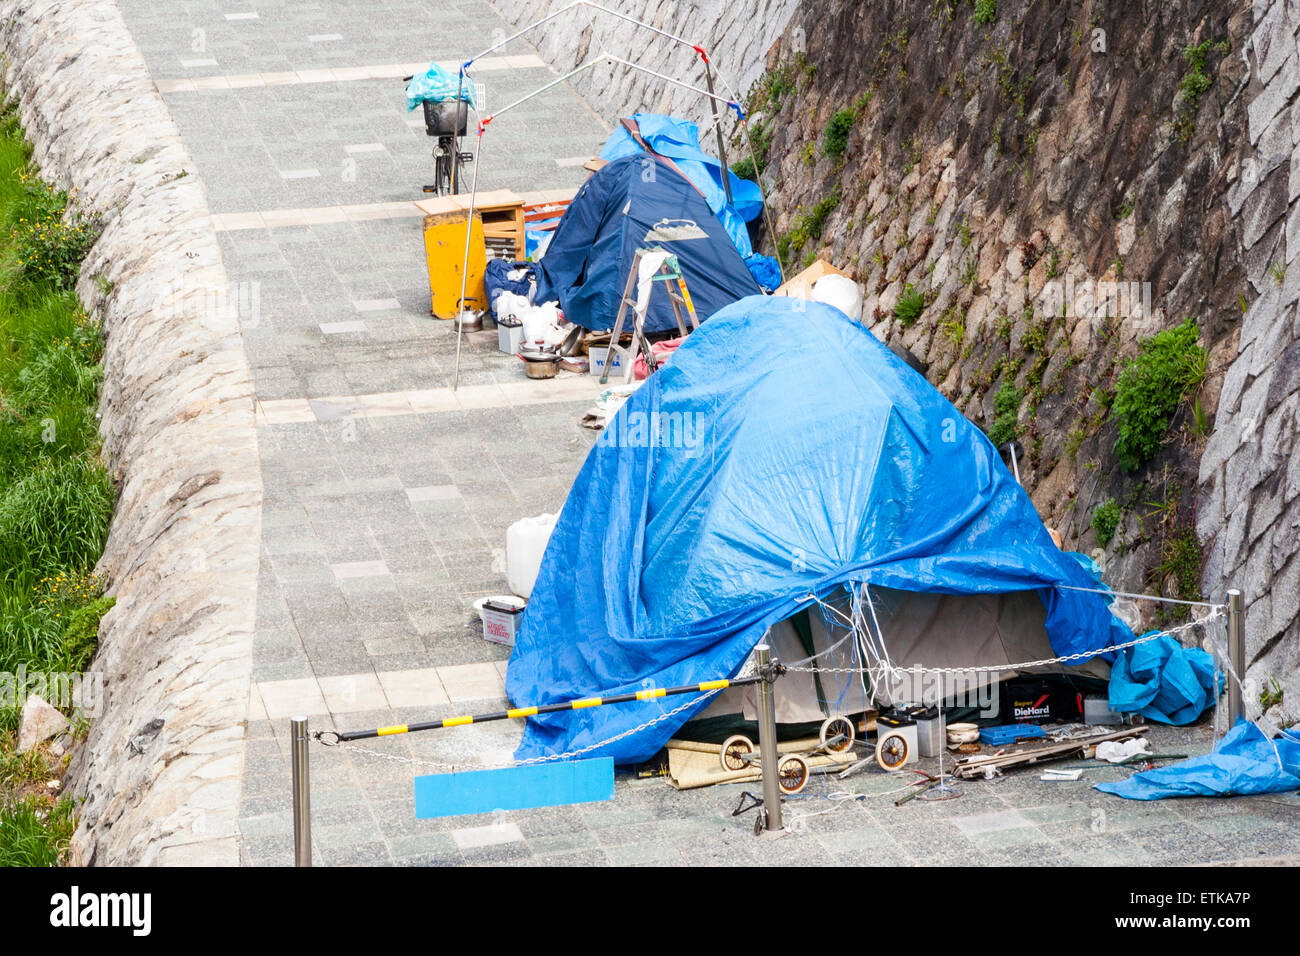 Japan, Kyoto. Blue tarpaulin homeless shelter on river bank, various belongings arranged along walkway by river - Stock Image